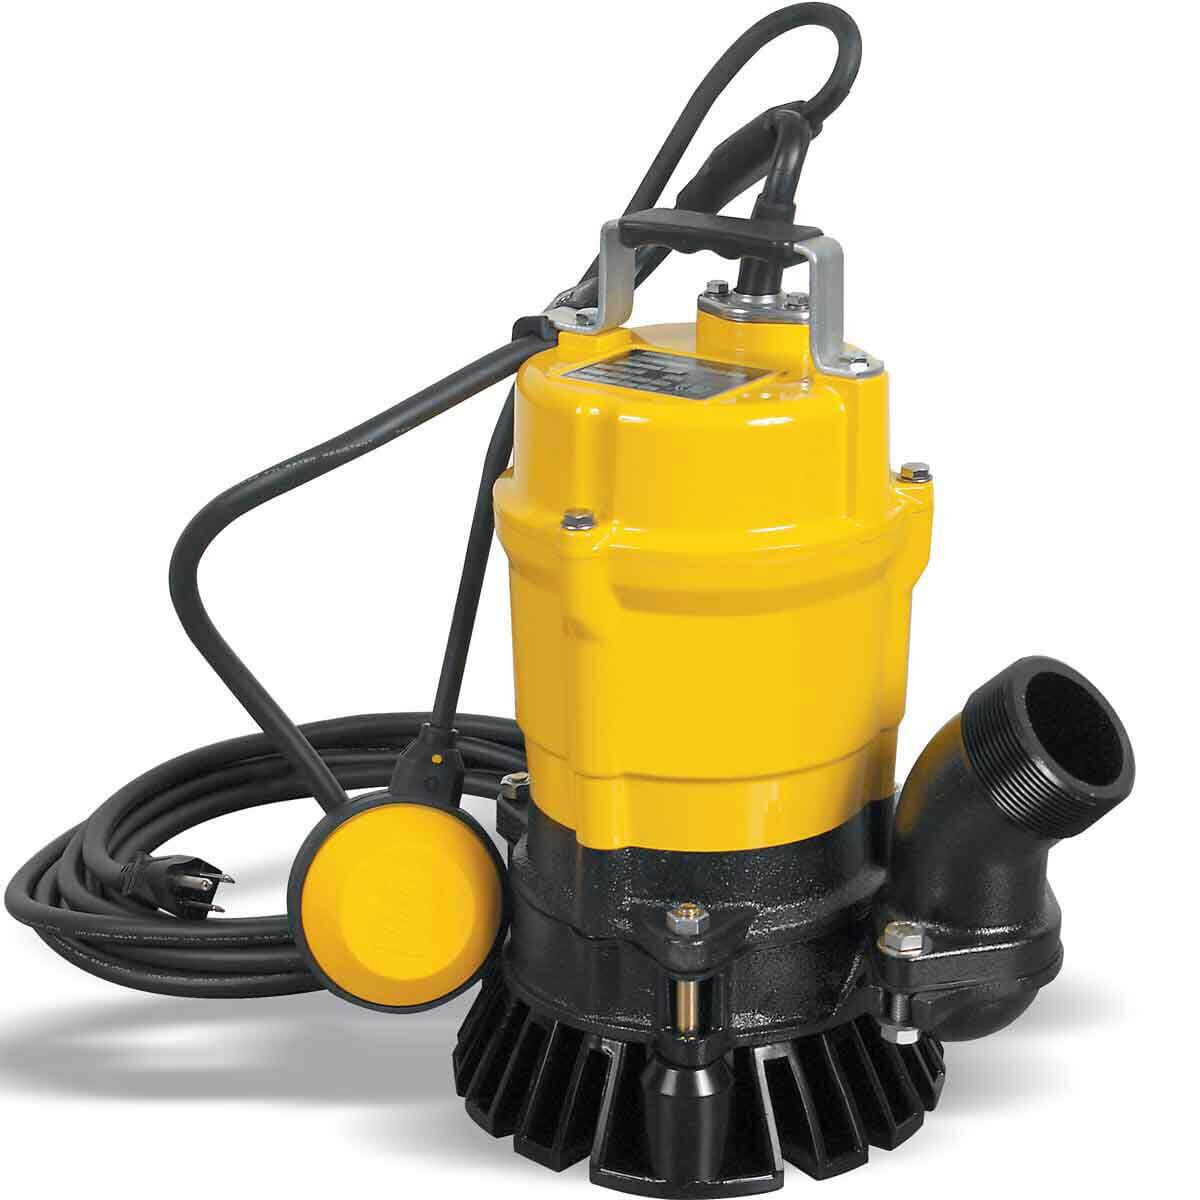 Wacker PSTF2-400 Electric Sub Pump